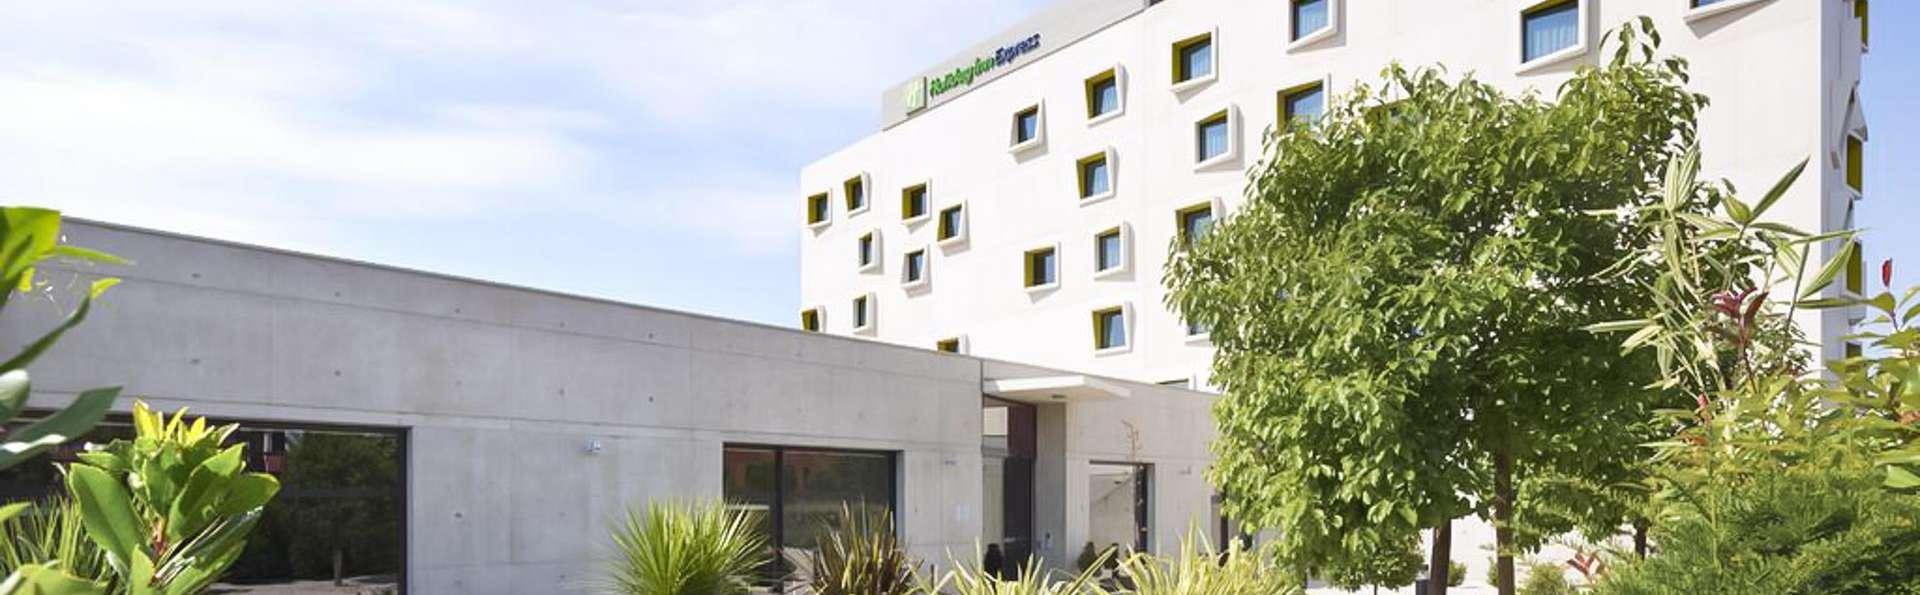 Holiday Inn Express Montpellier Odysseum  - EDIT_FRONT_02.jpg